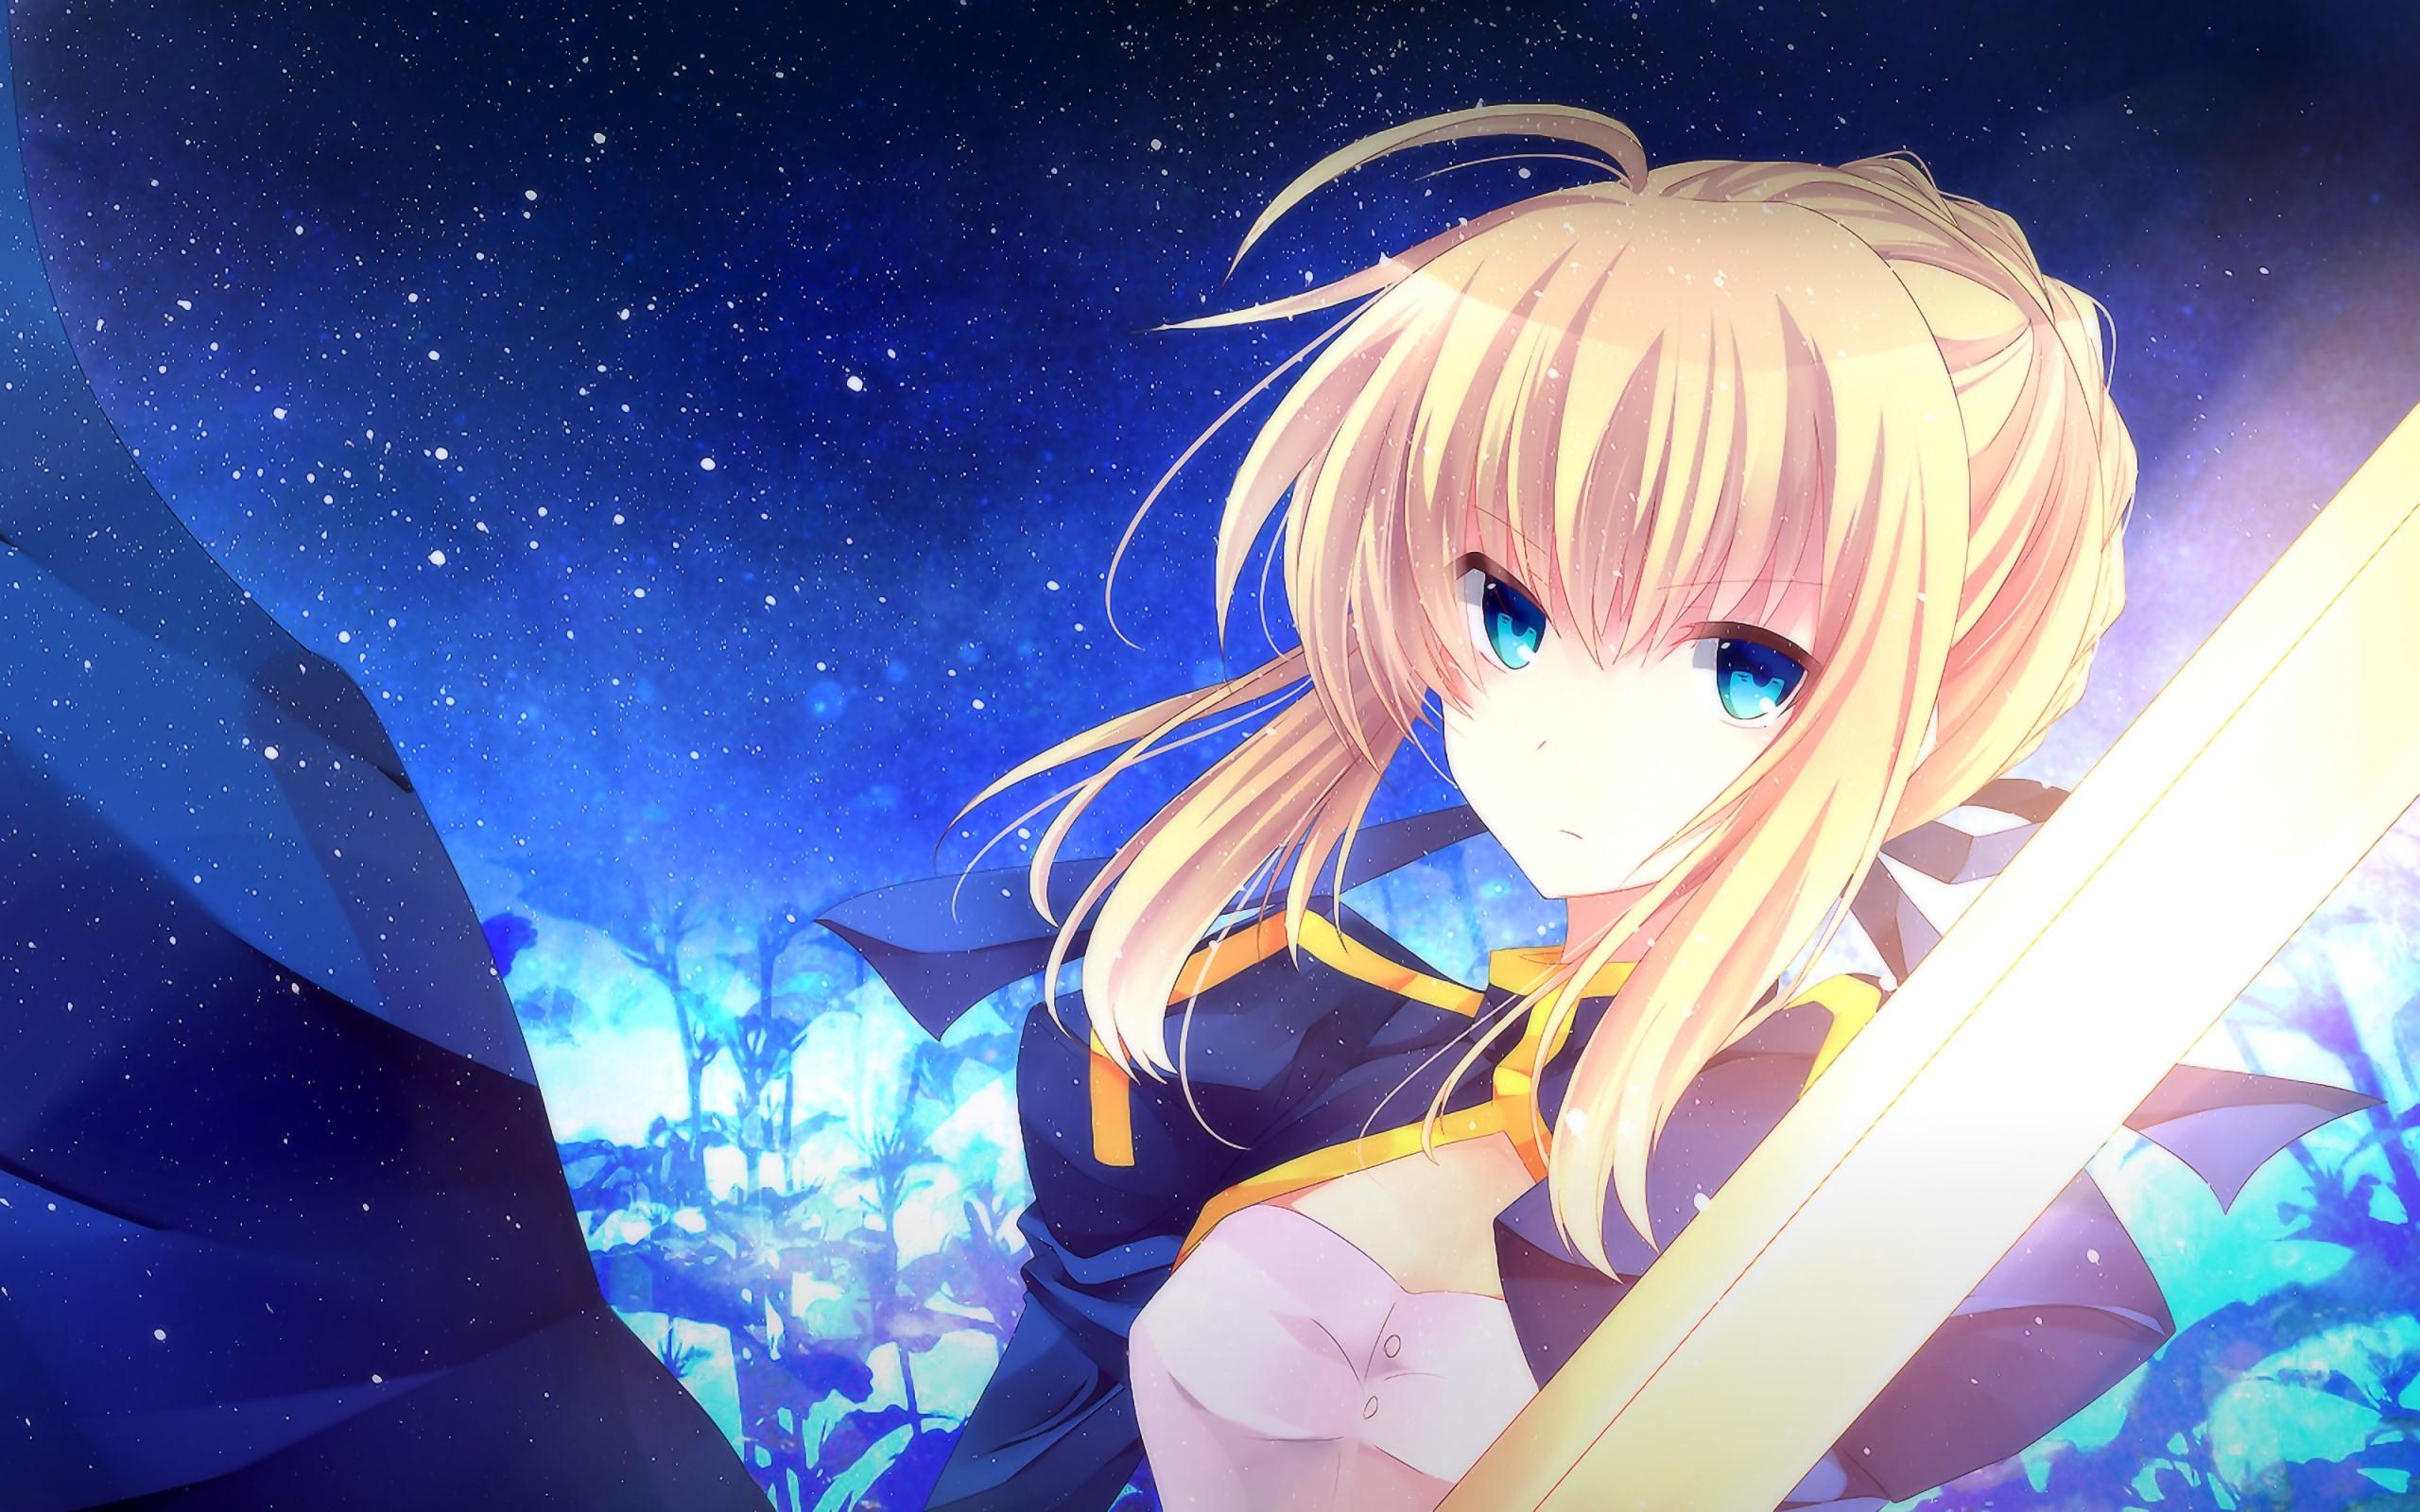 Fate zero online anime dating 8